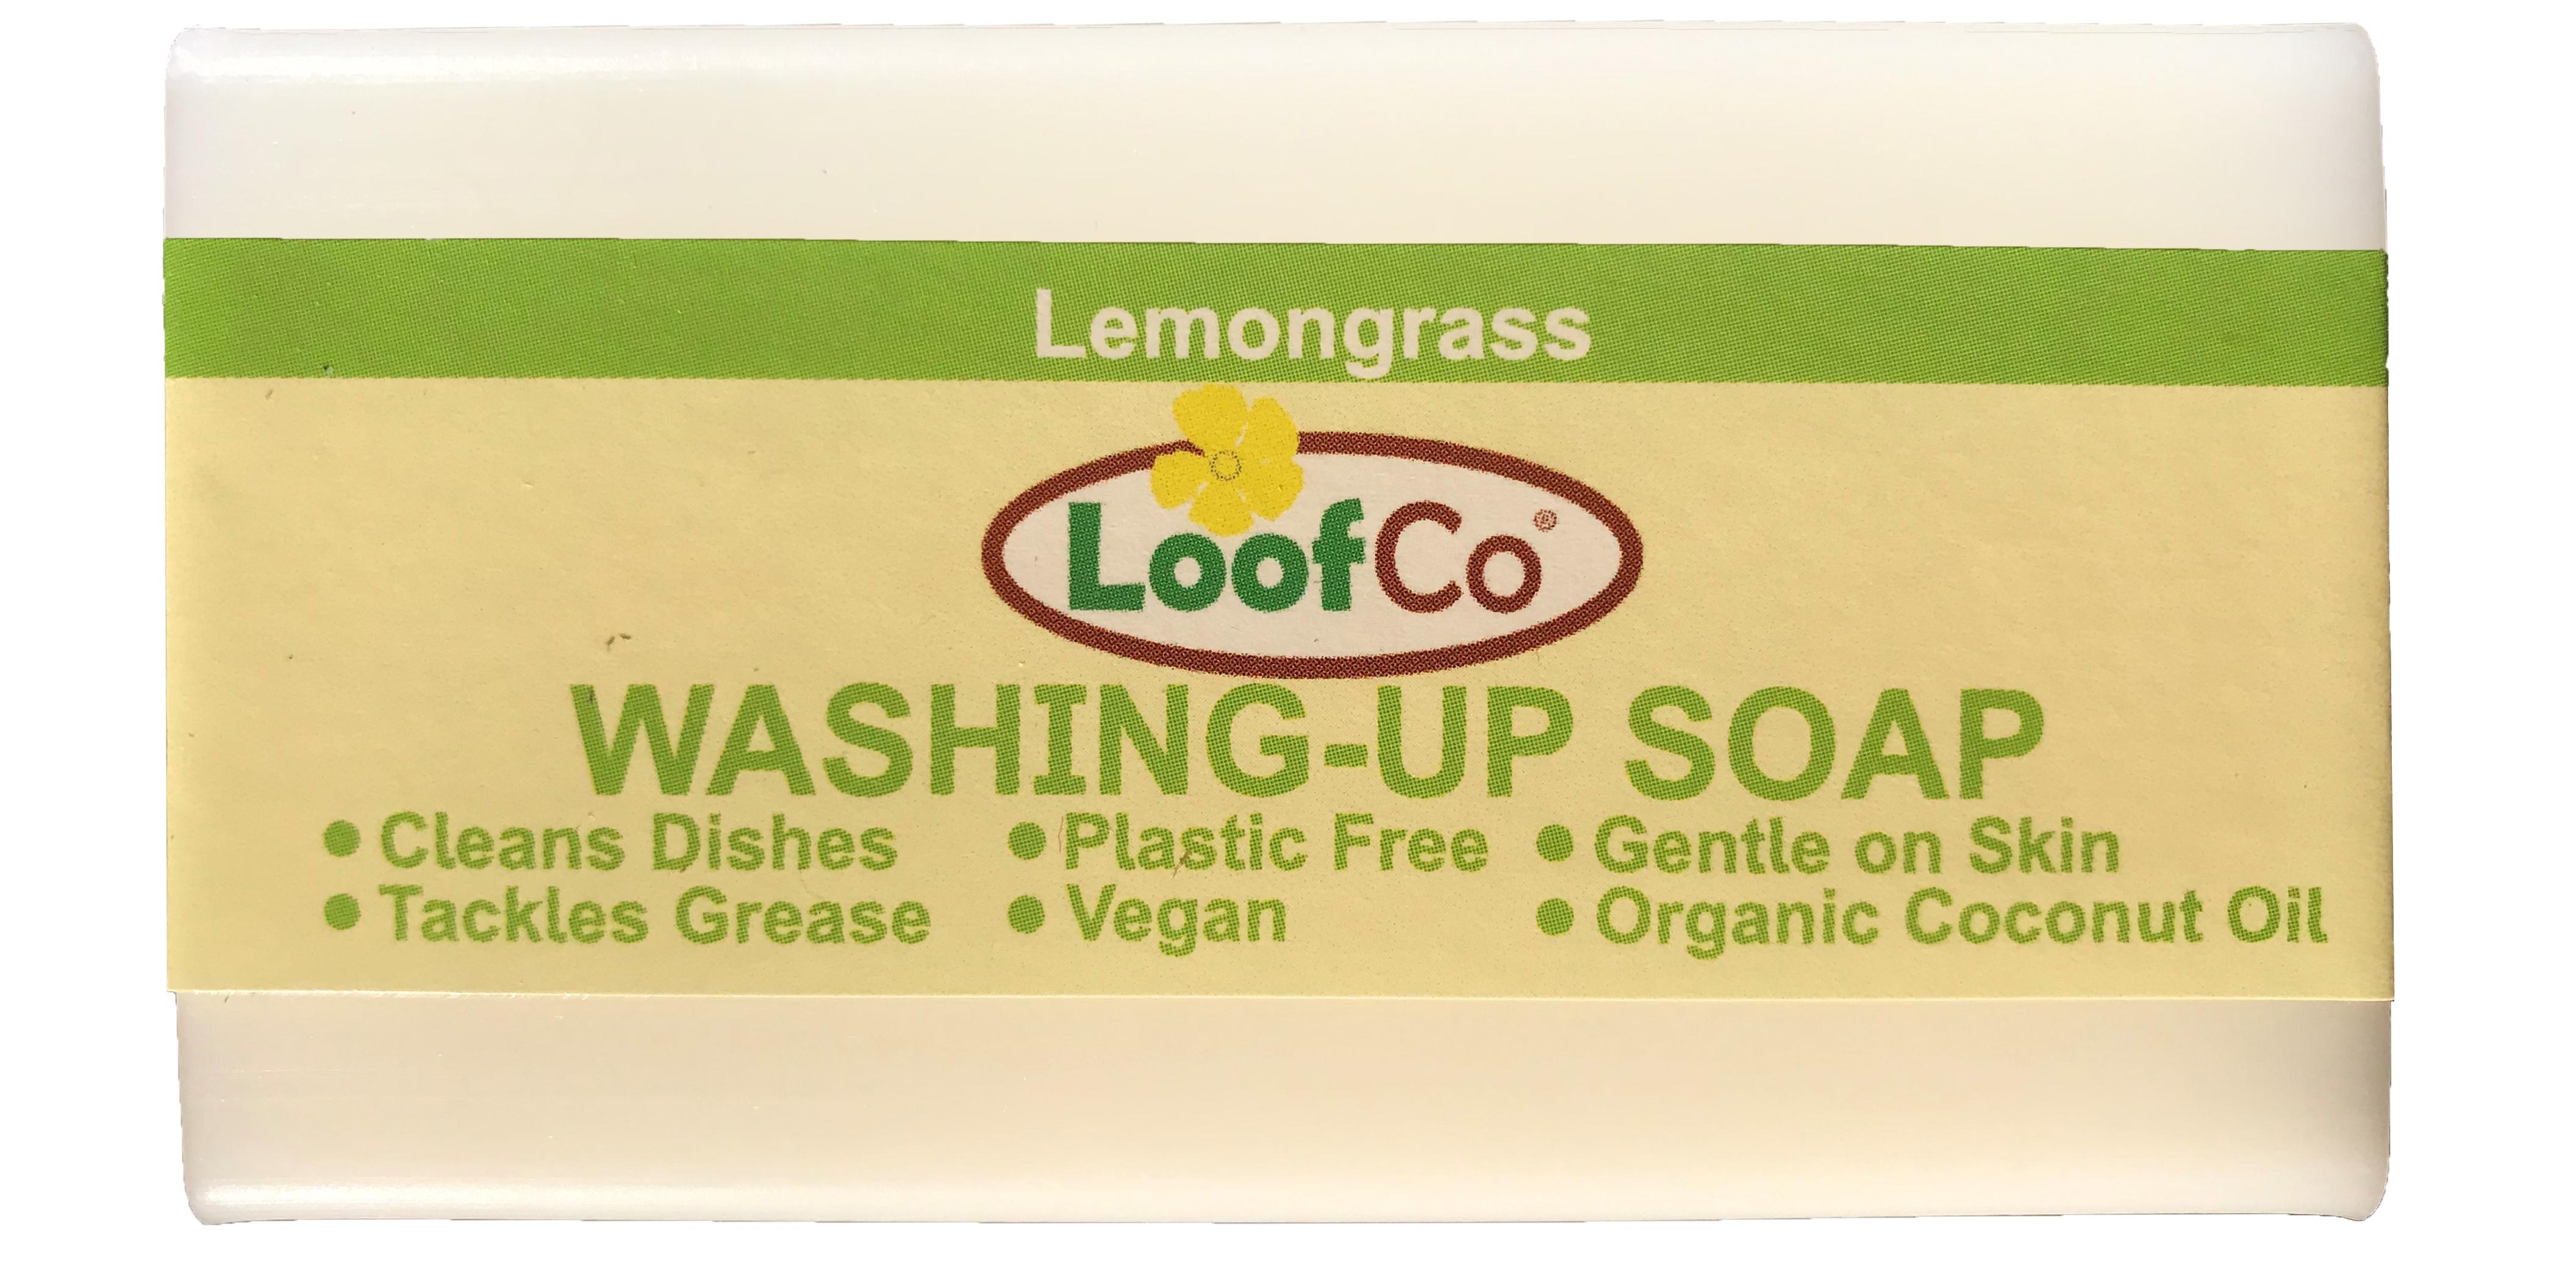 Sapun solid pentru vase, cu lemongrass, LoofCo,100 g 0